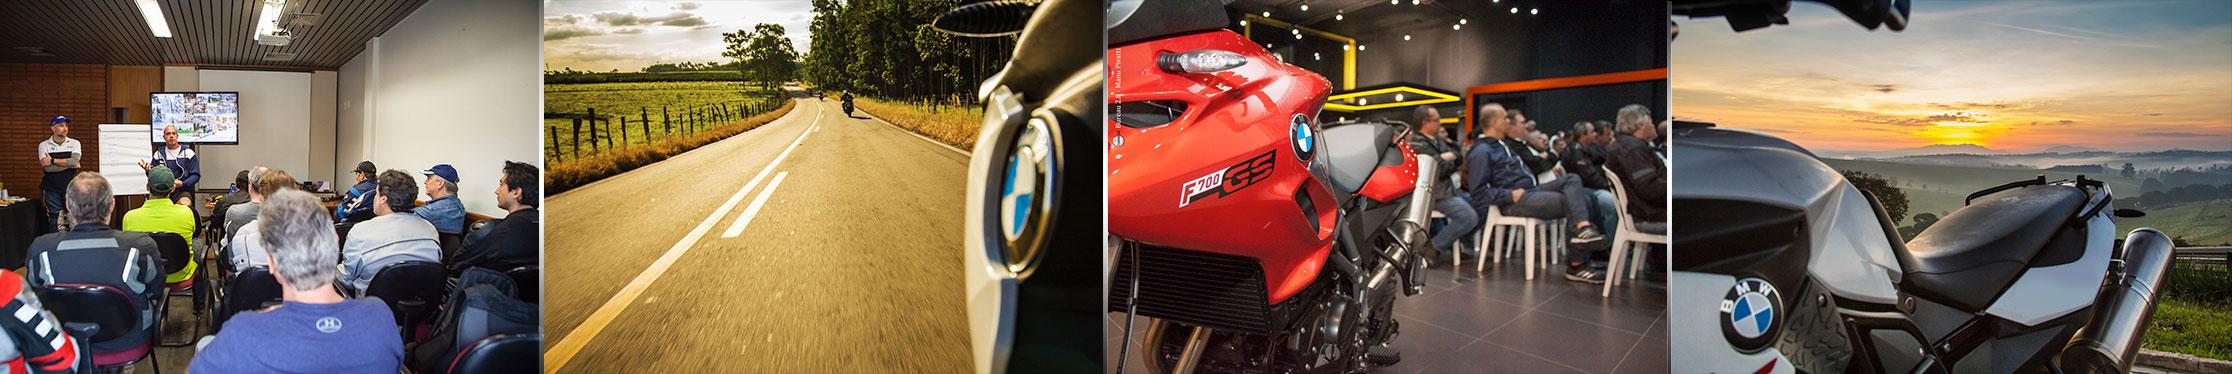 BMW-Rider-Experience_Palestra-planejamento-viagens